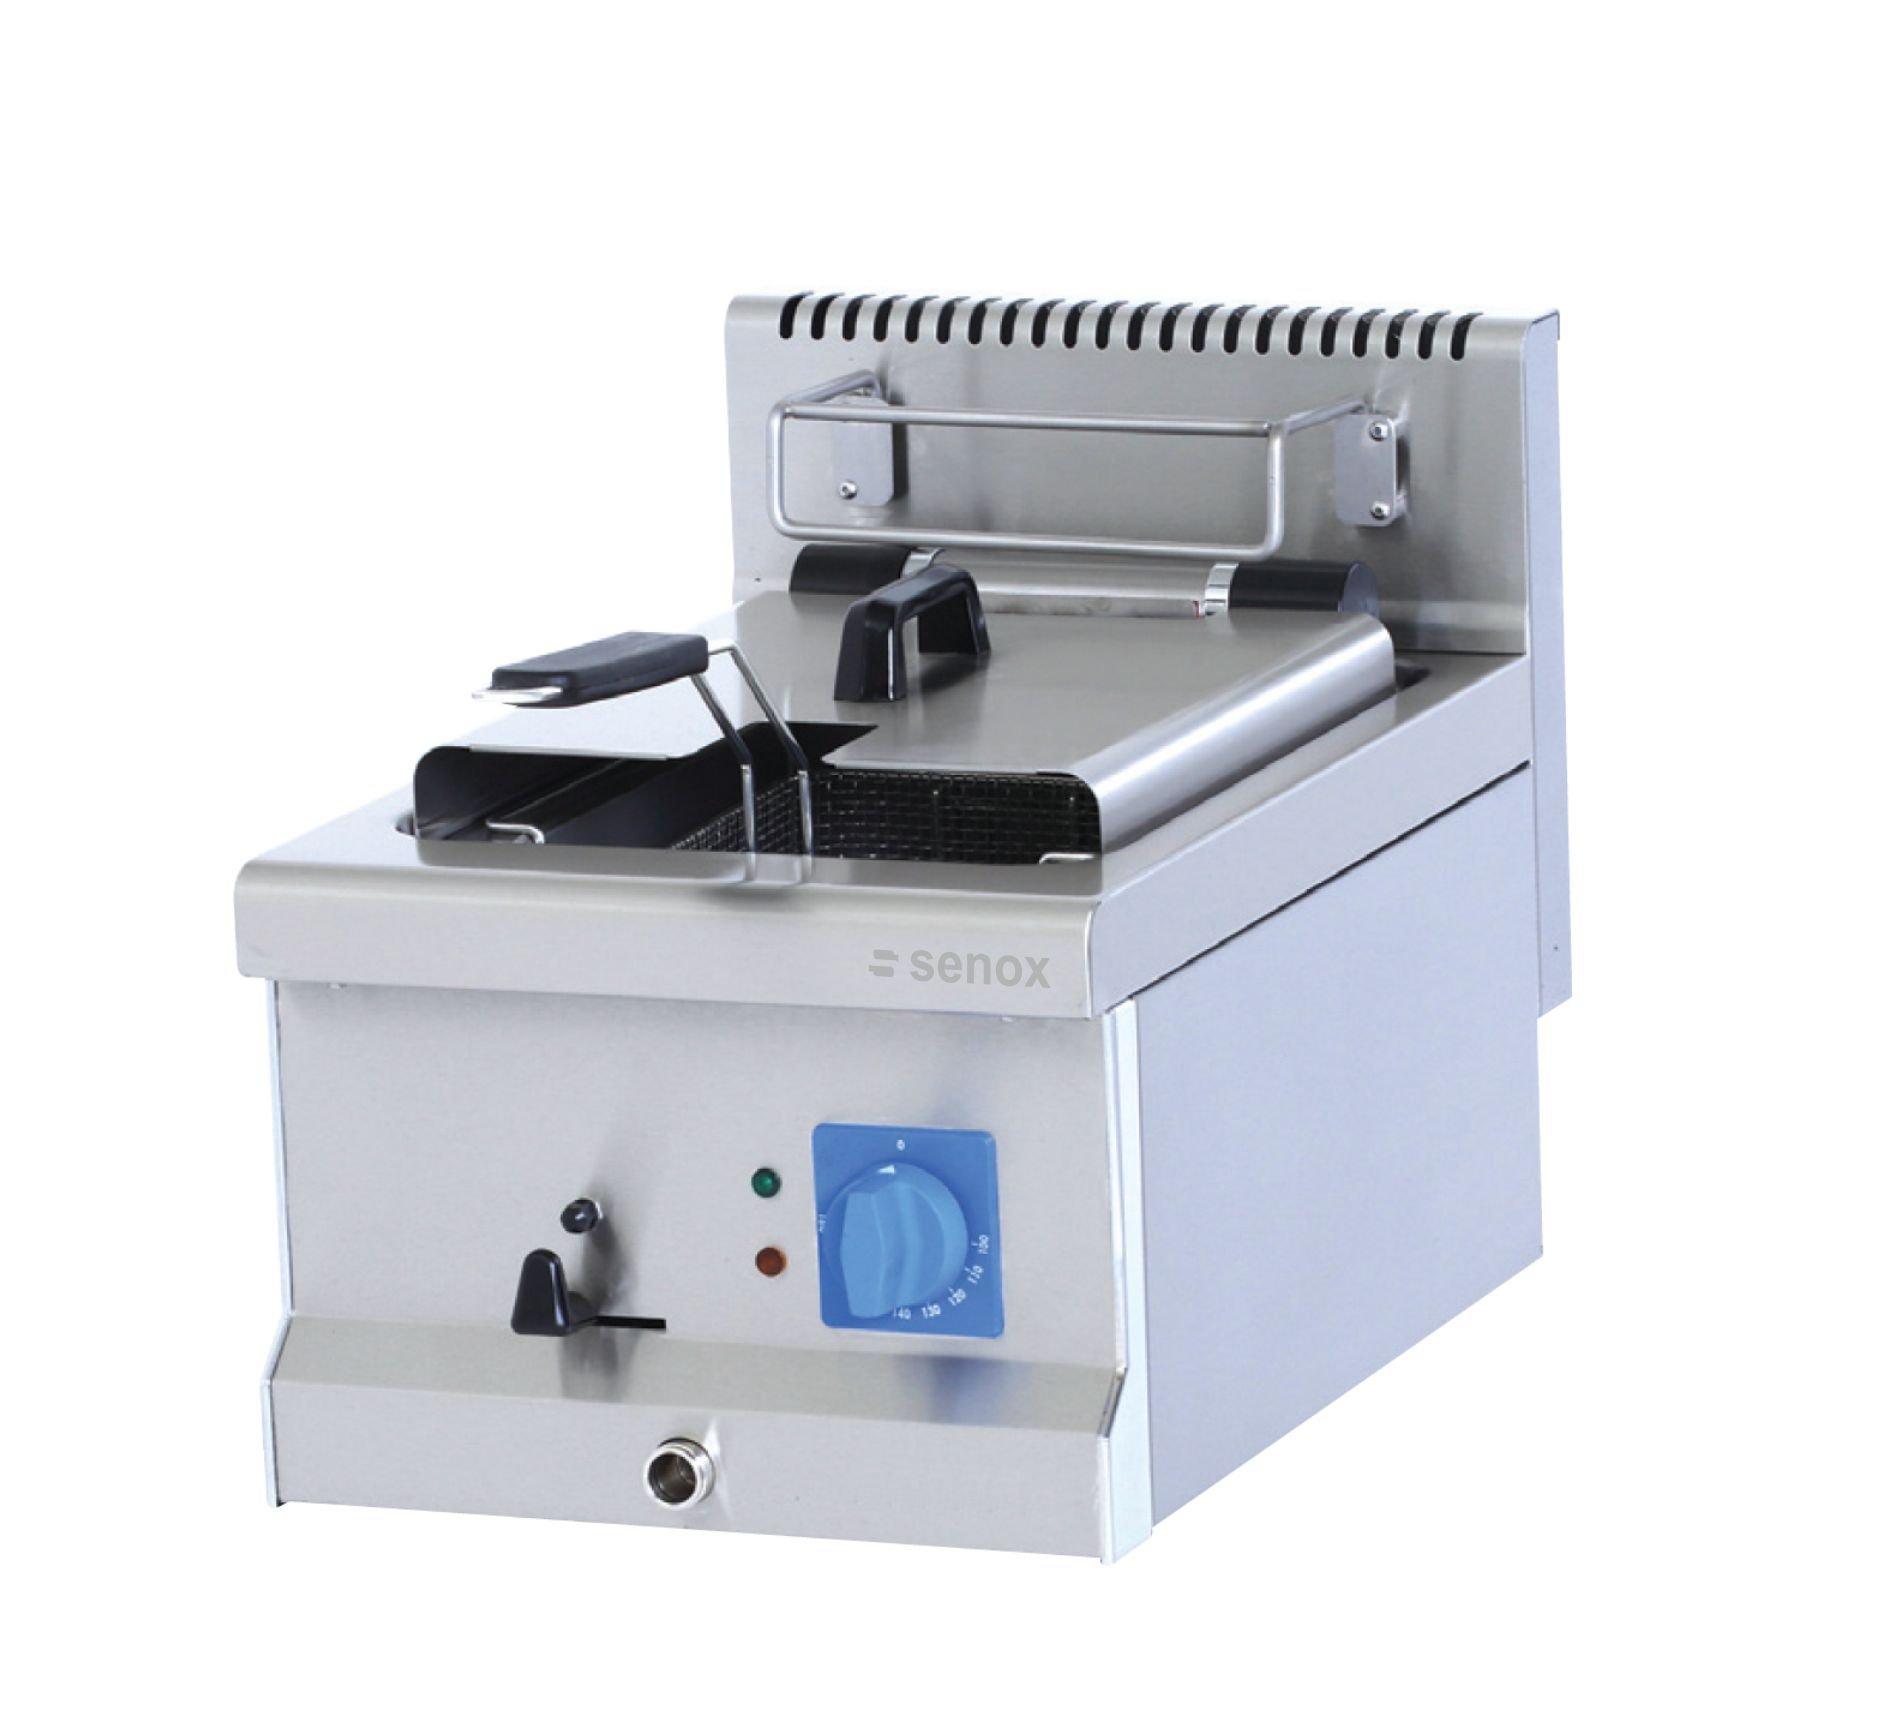 senox-aef-460-elektrikli-fritoz